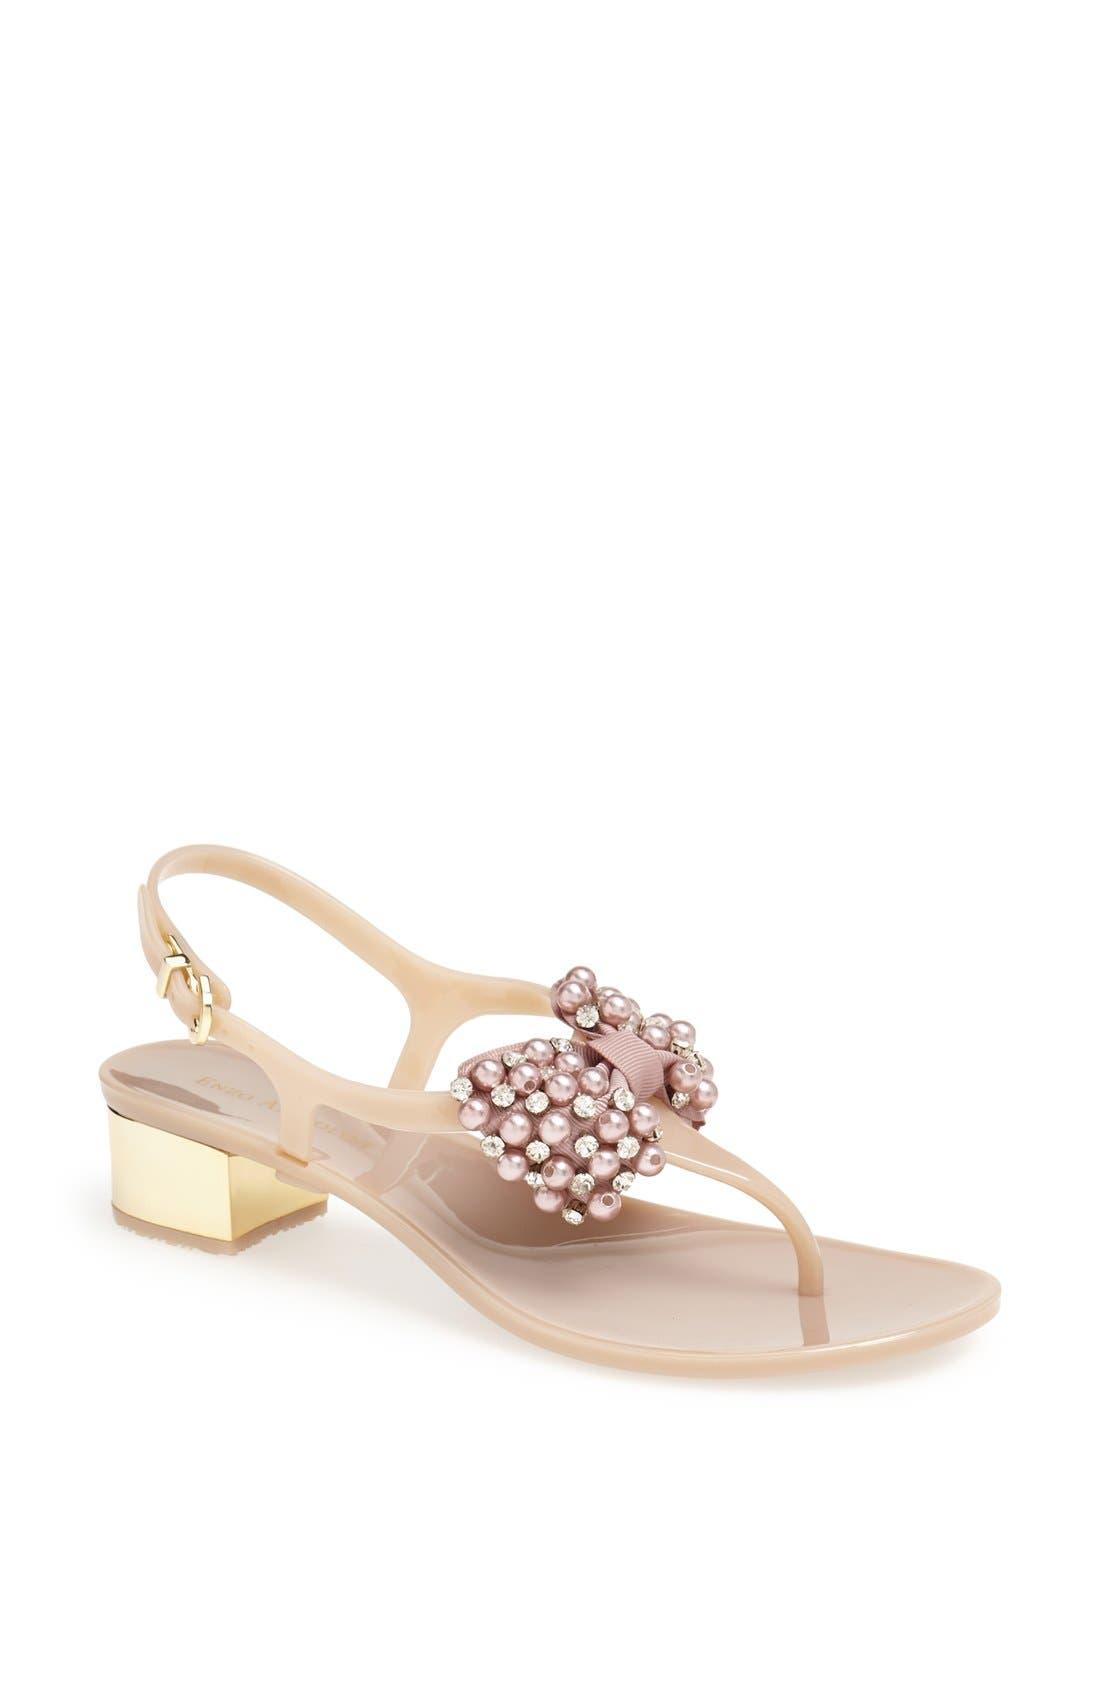 Main Image - Enzo Angiolini 'Aiza' Thong Sandal